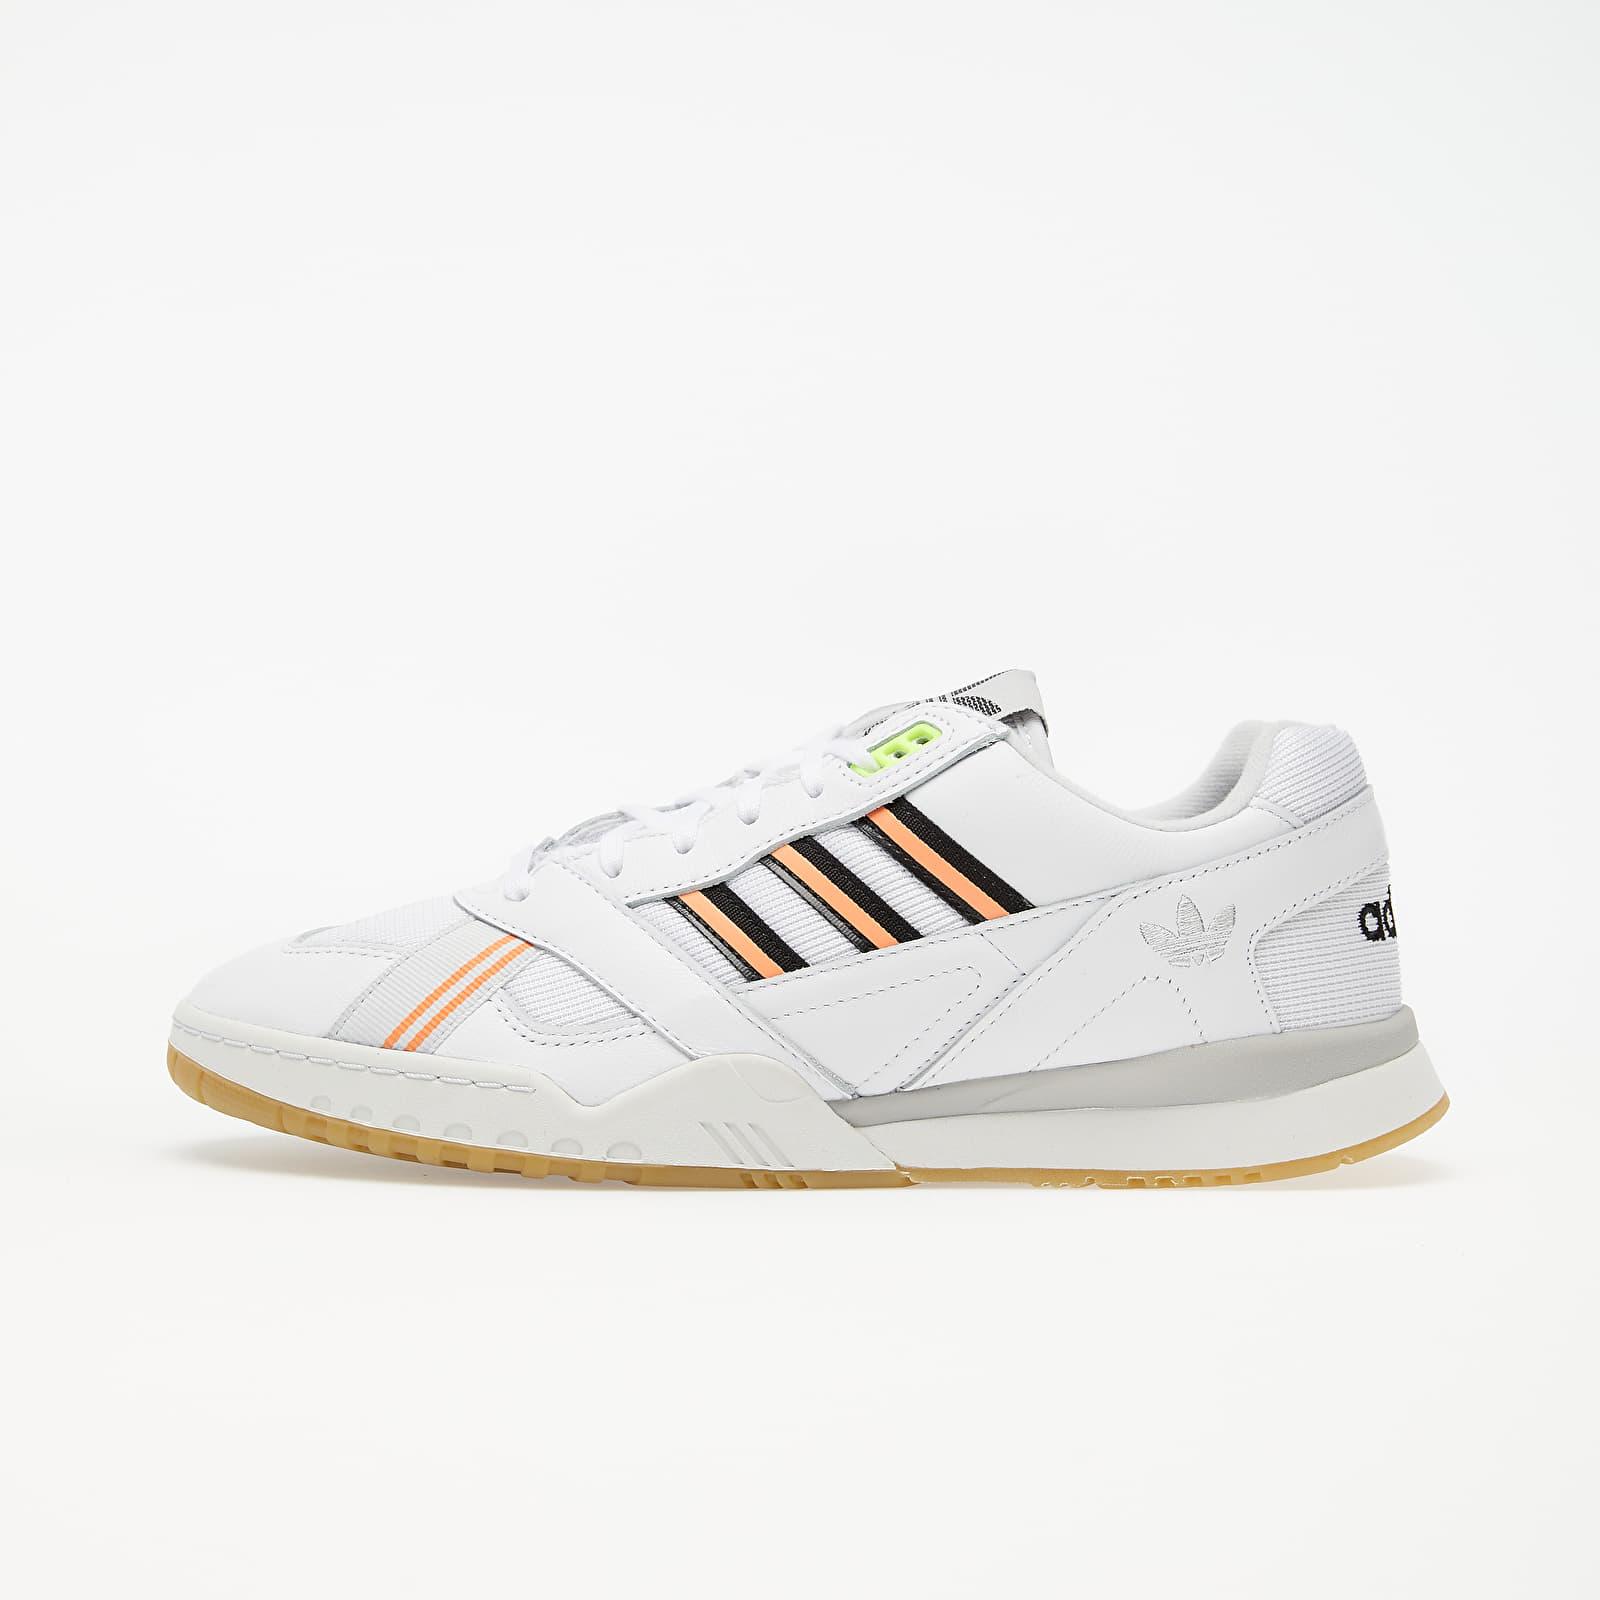 Pánské tenisky a boty adidas A.R. Trainer Ftw White/ Core Black/ Amber Tint